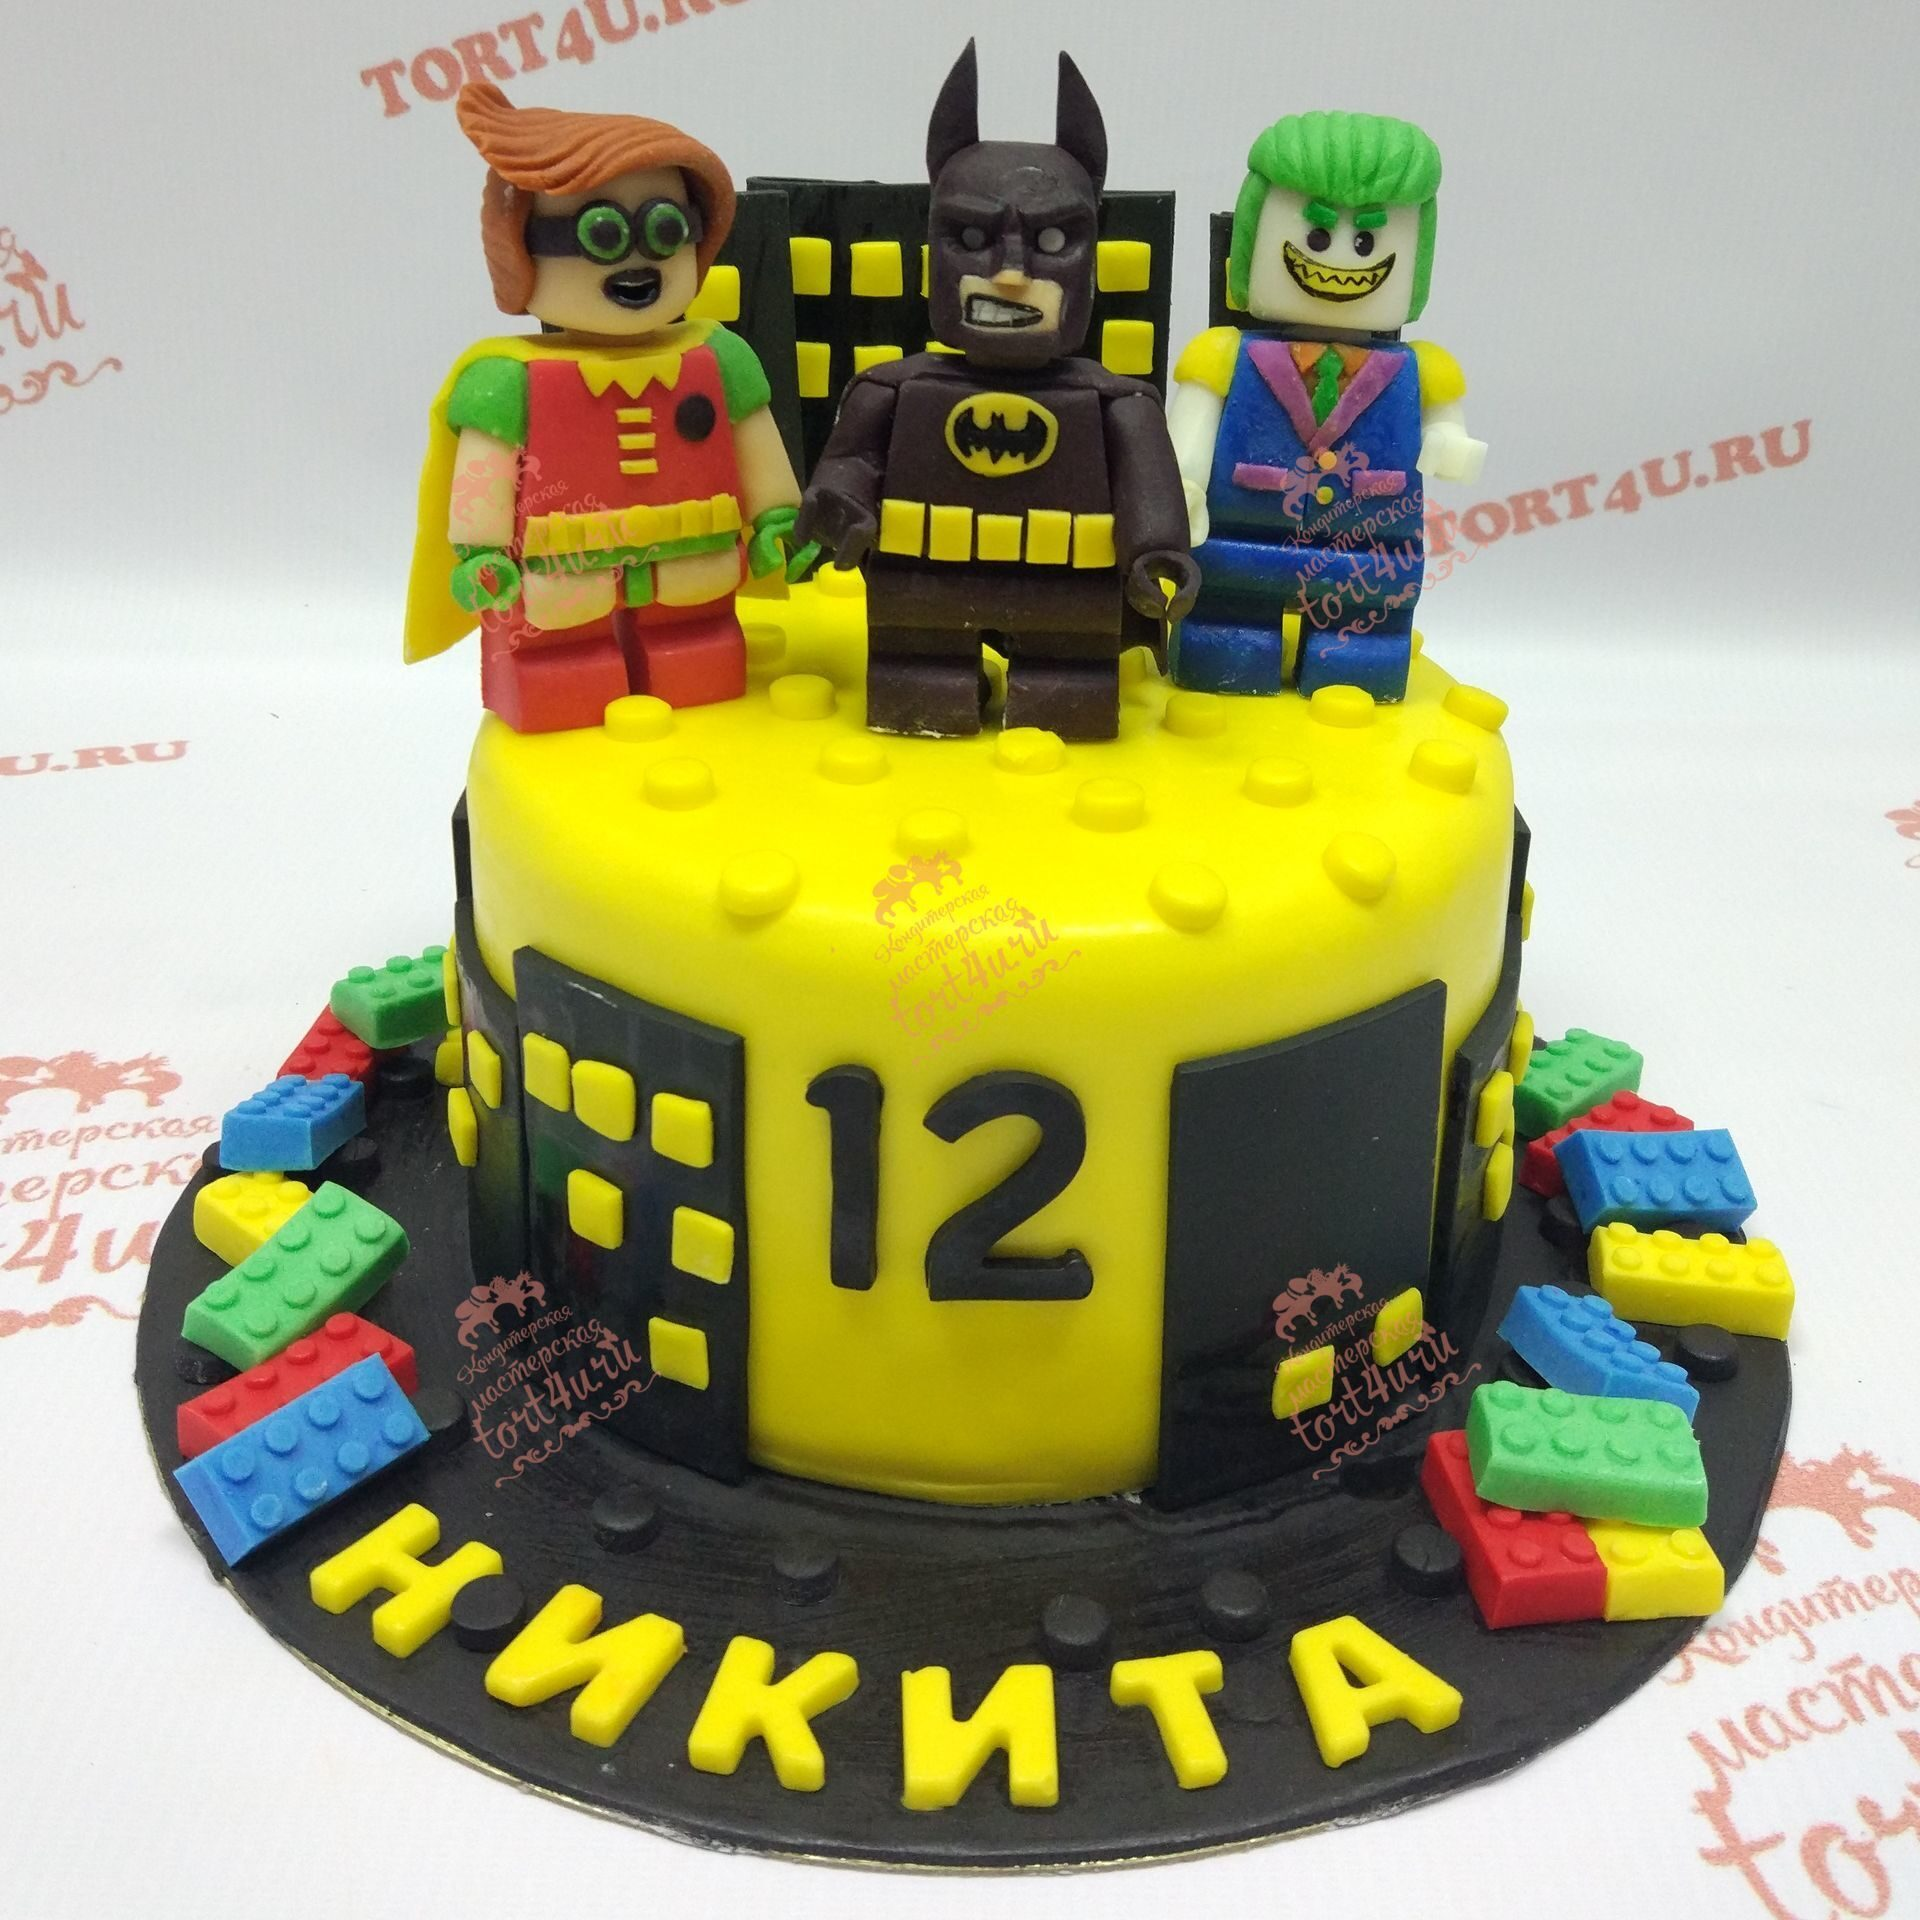 4bfa3de1f Артикул: Торт лего бэтмен - 103. Подробная информация >>